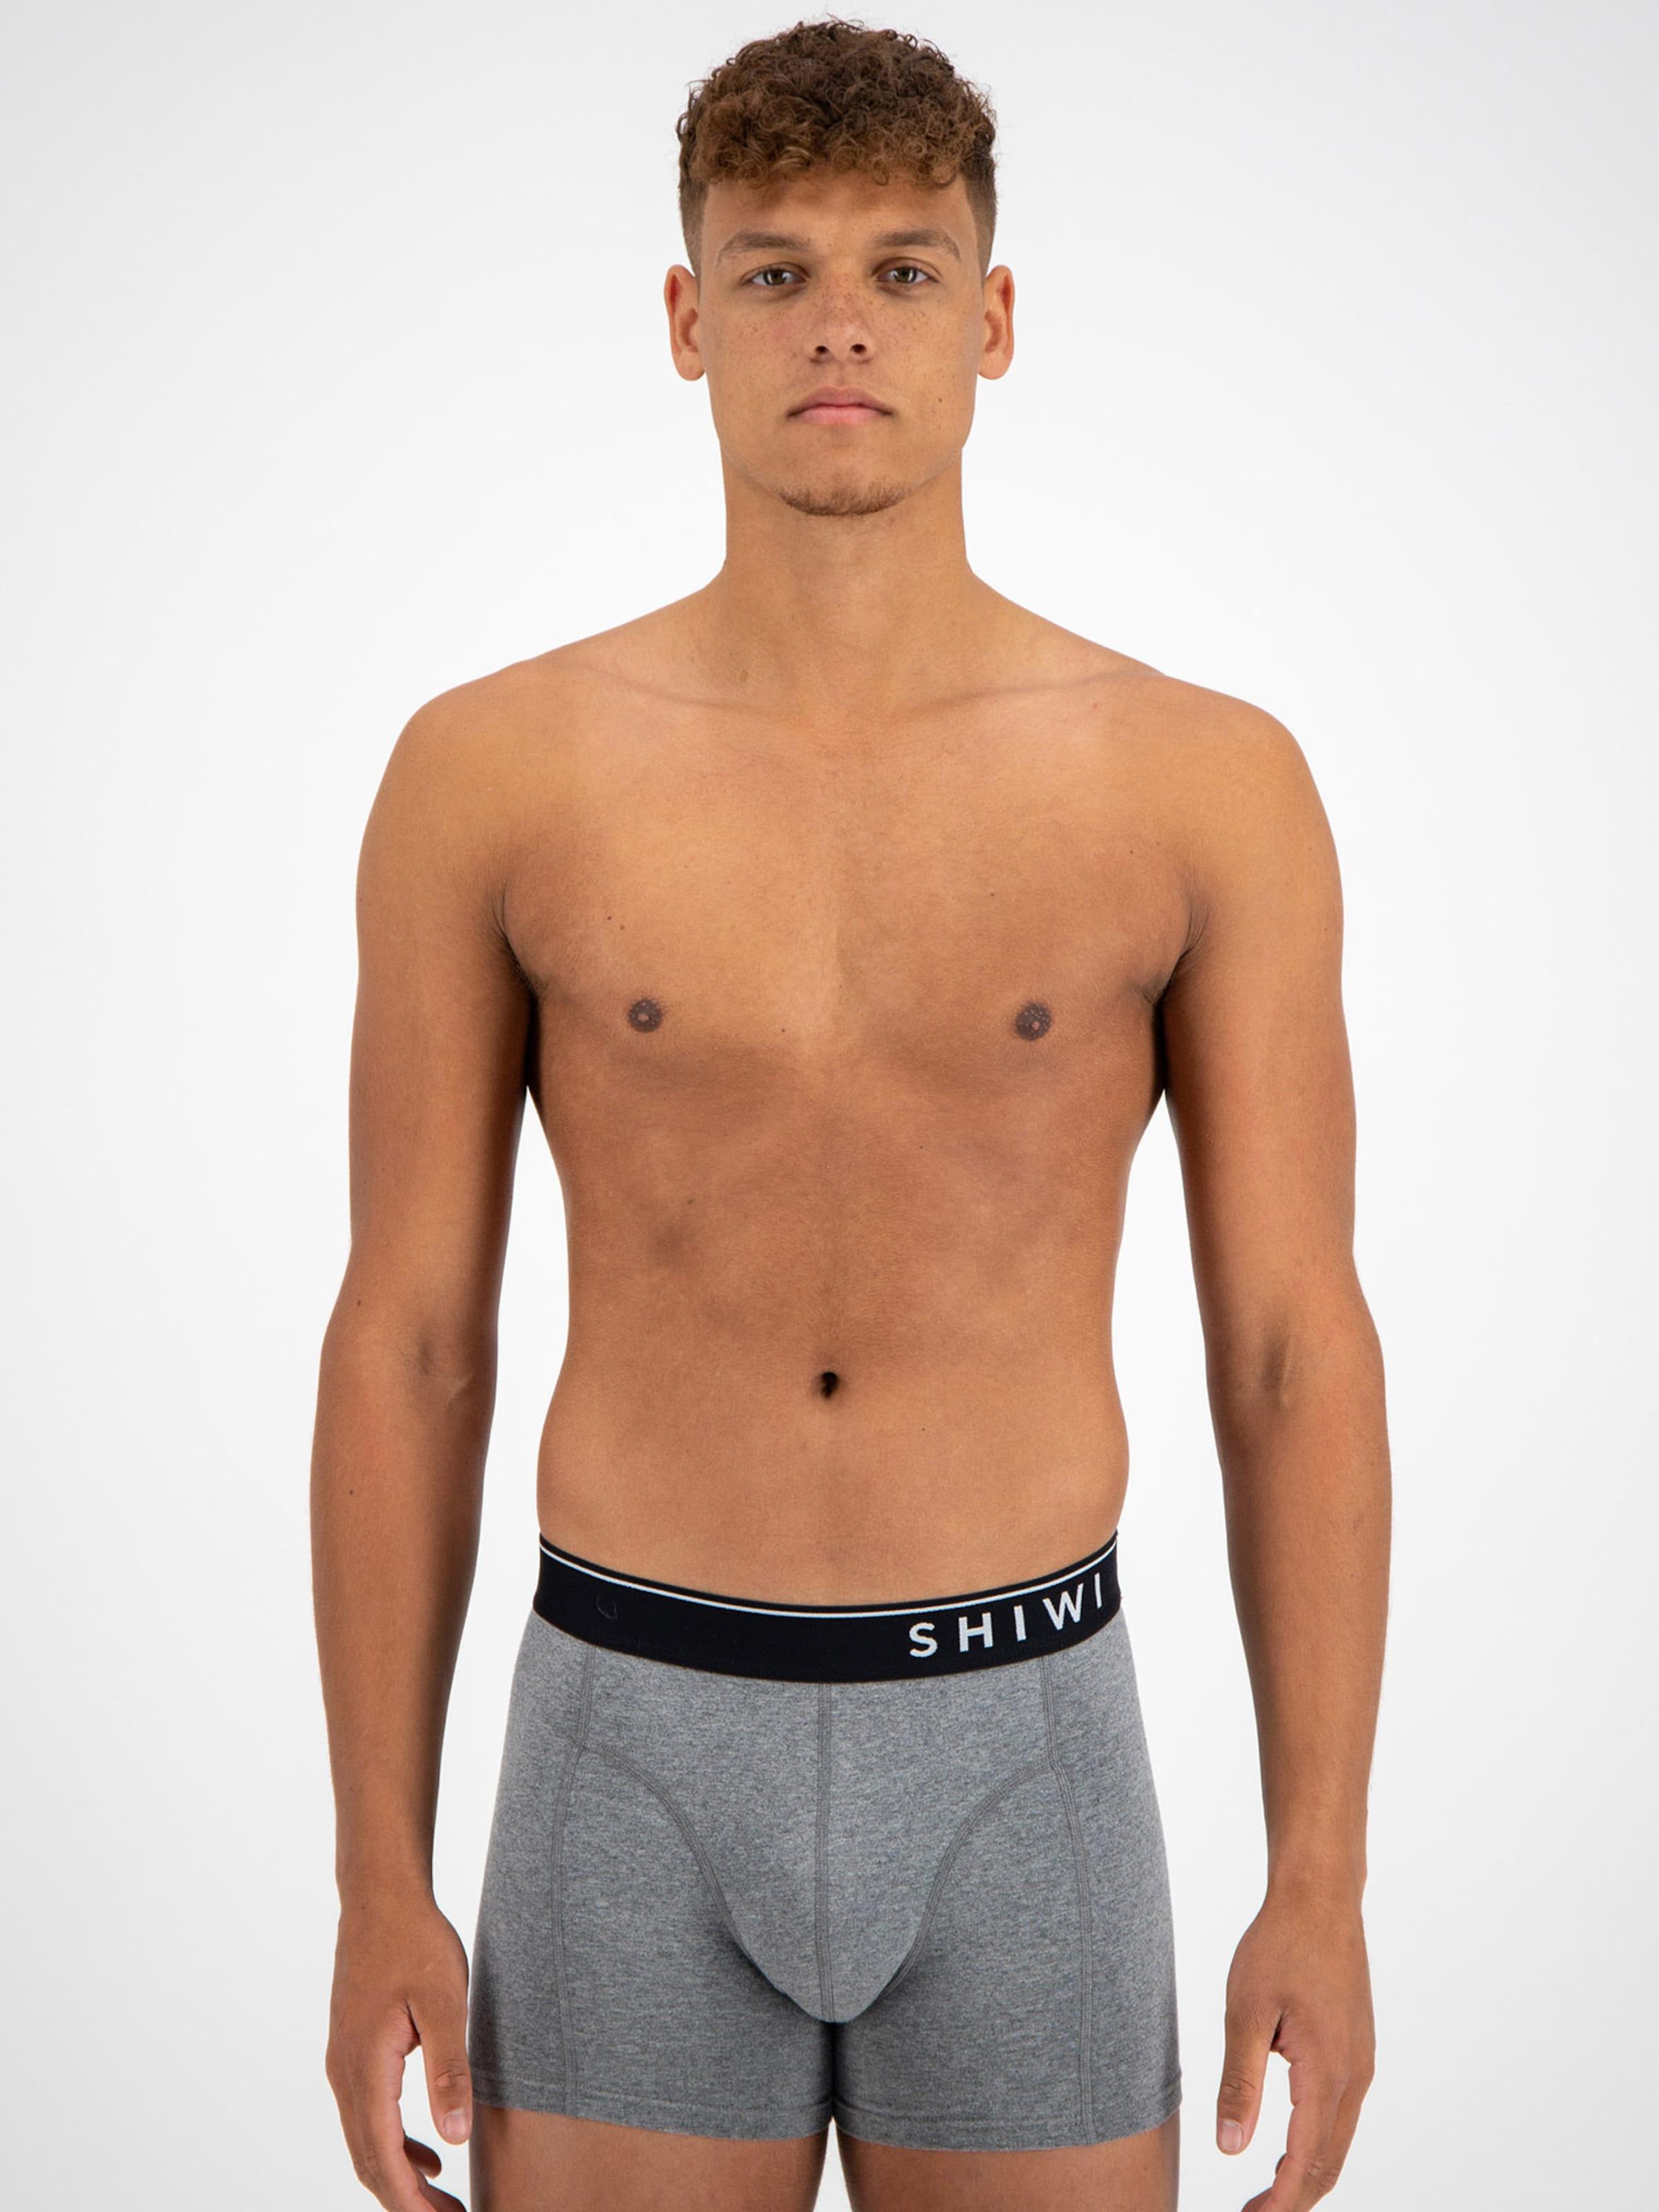 Shiwi Boxershorts i svart / vit